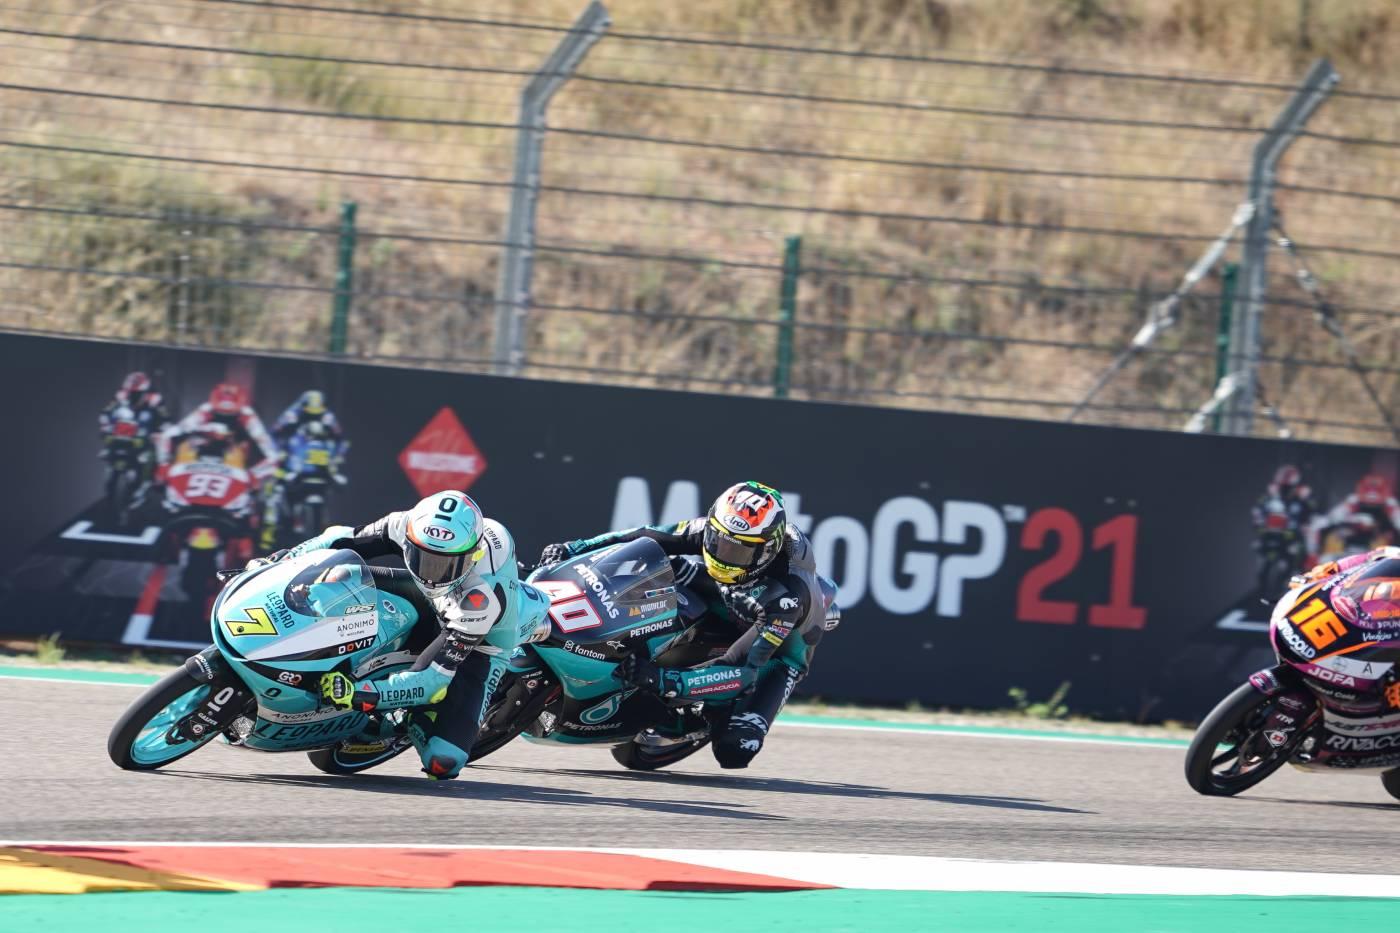 Foggia And His NSF250RW Take Their Third Victory of 2021